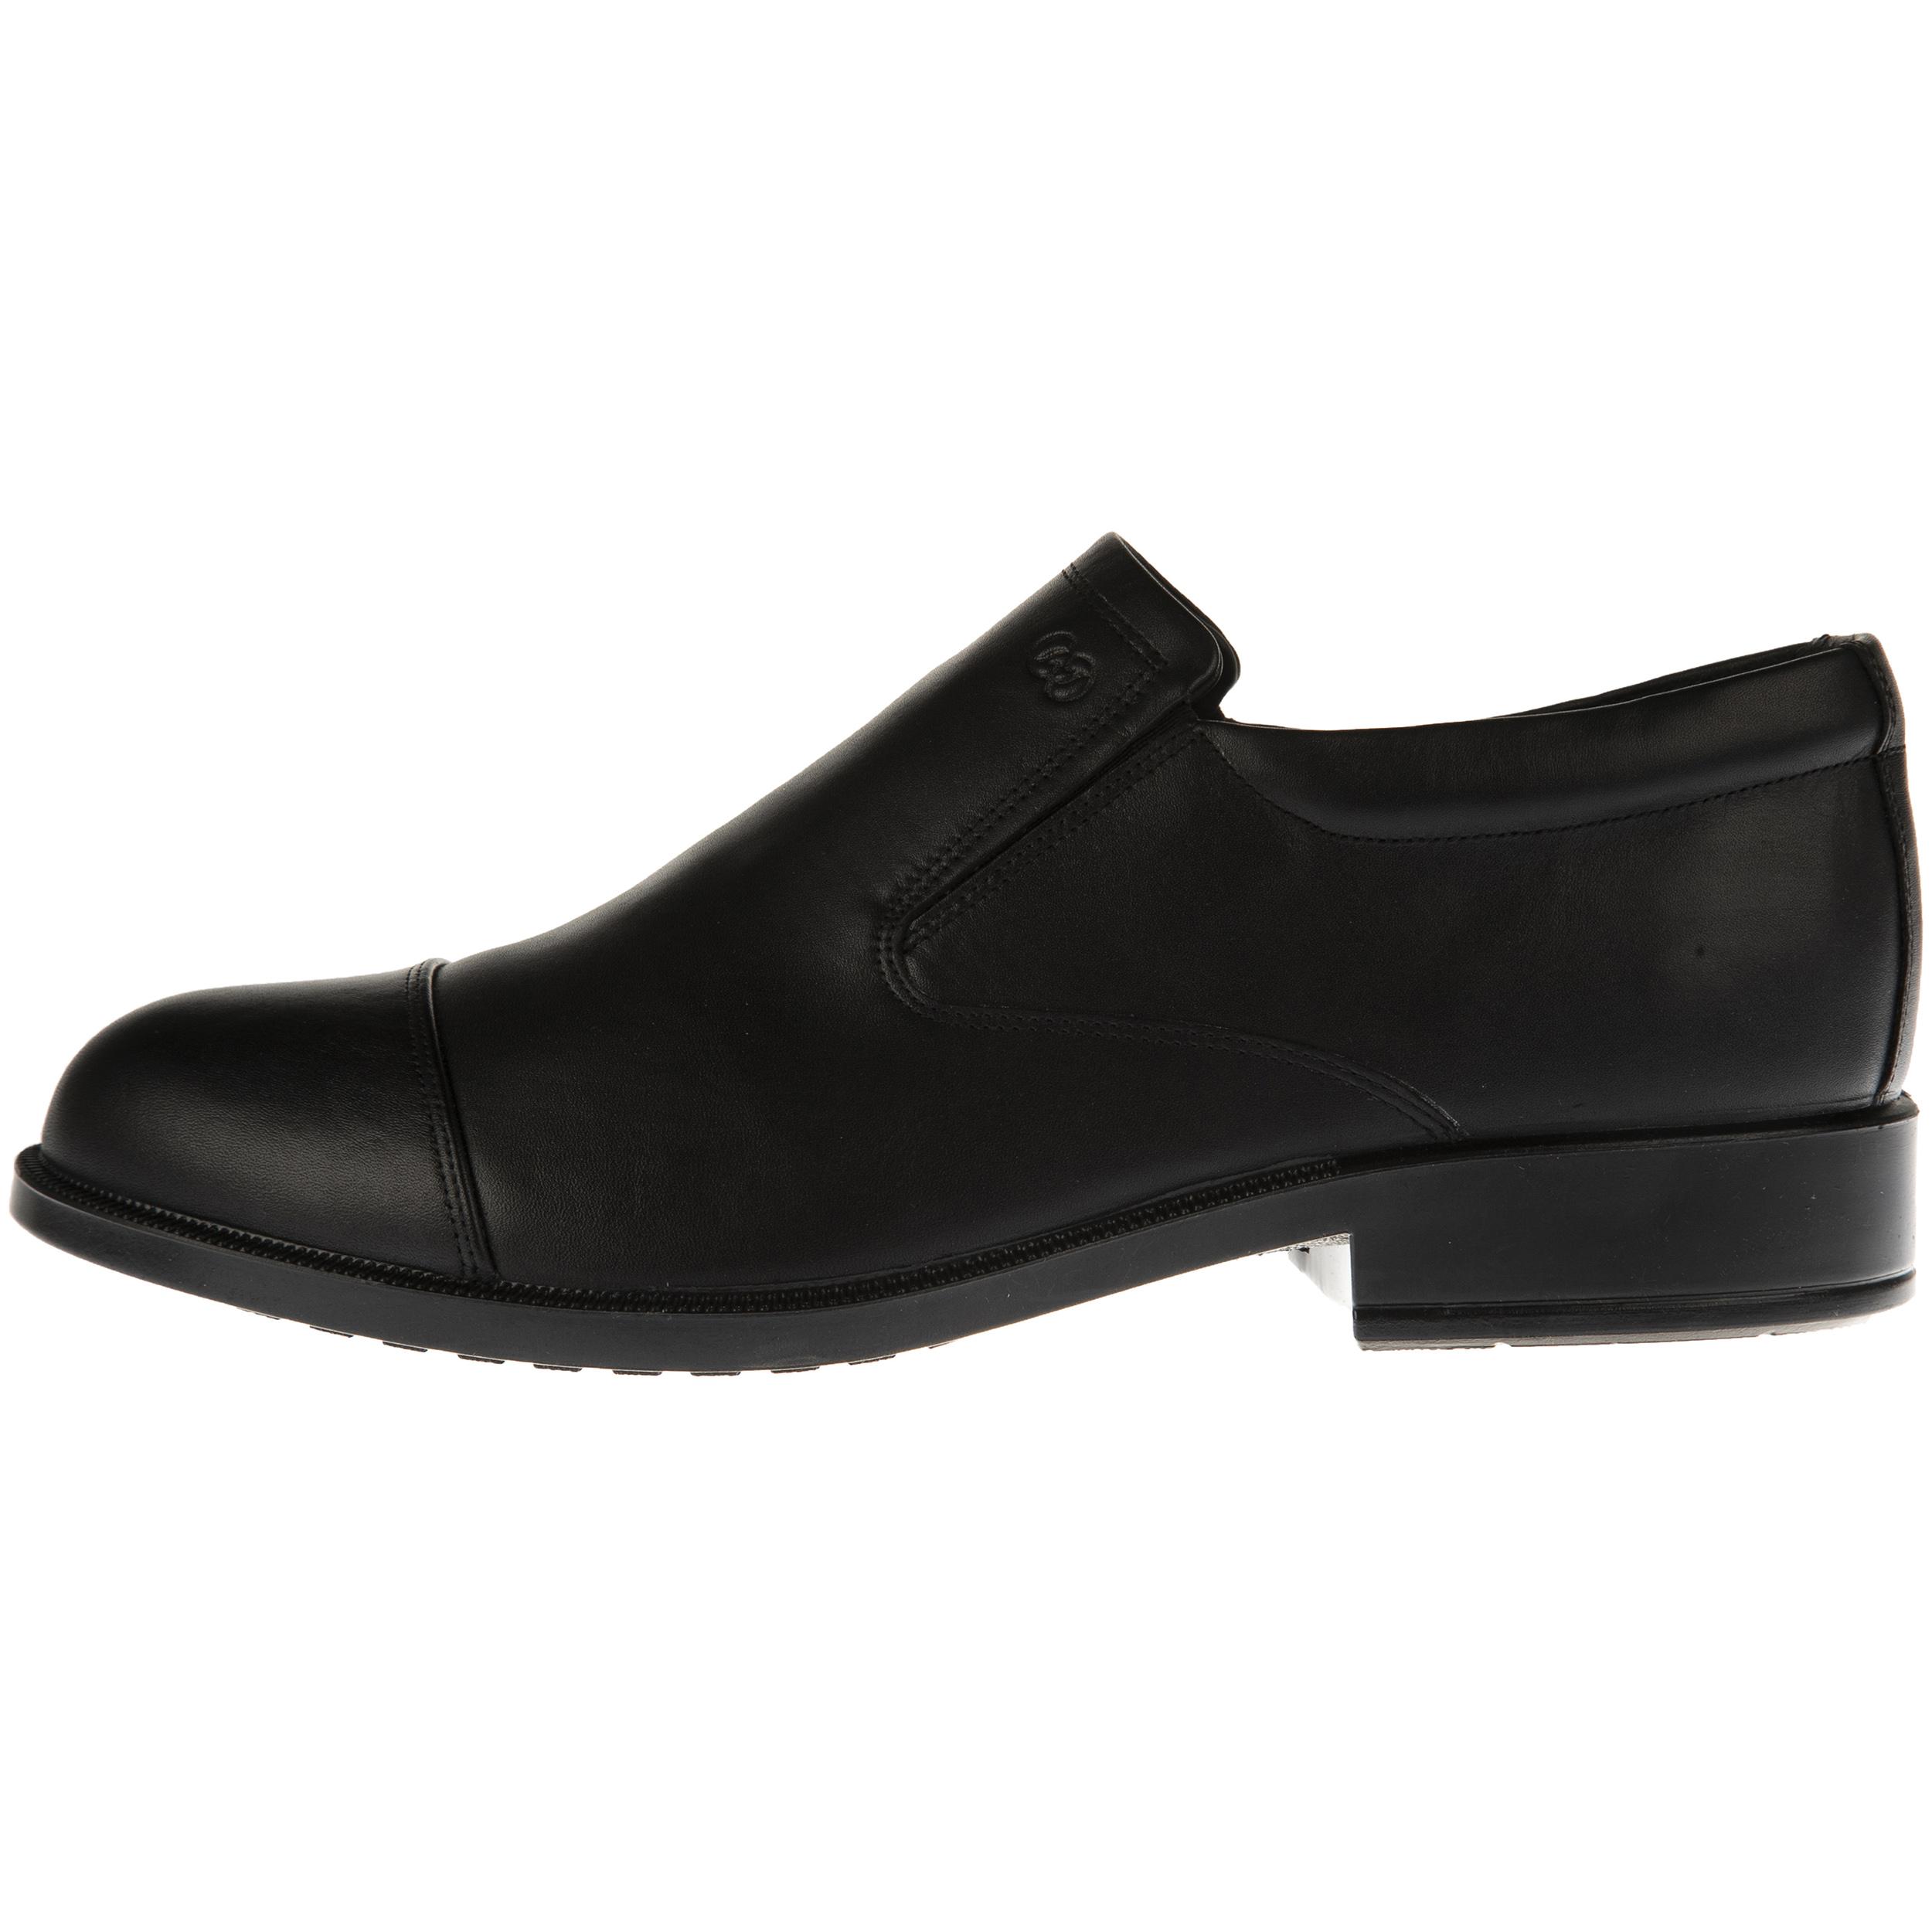 کفش مردانه دنیلی مدل 109110101001